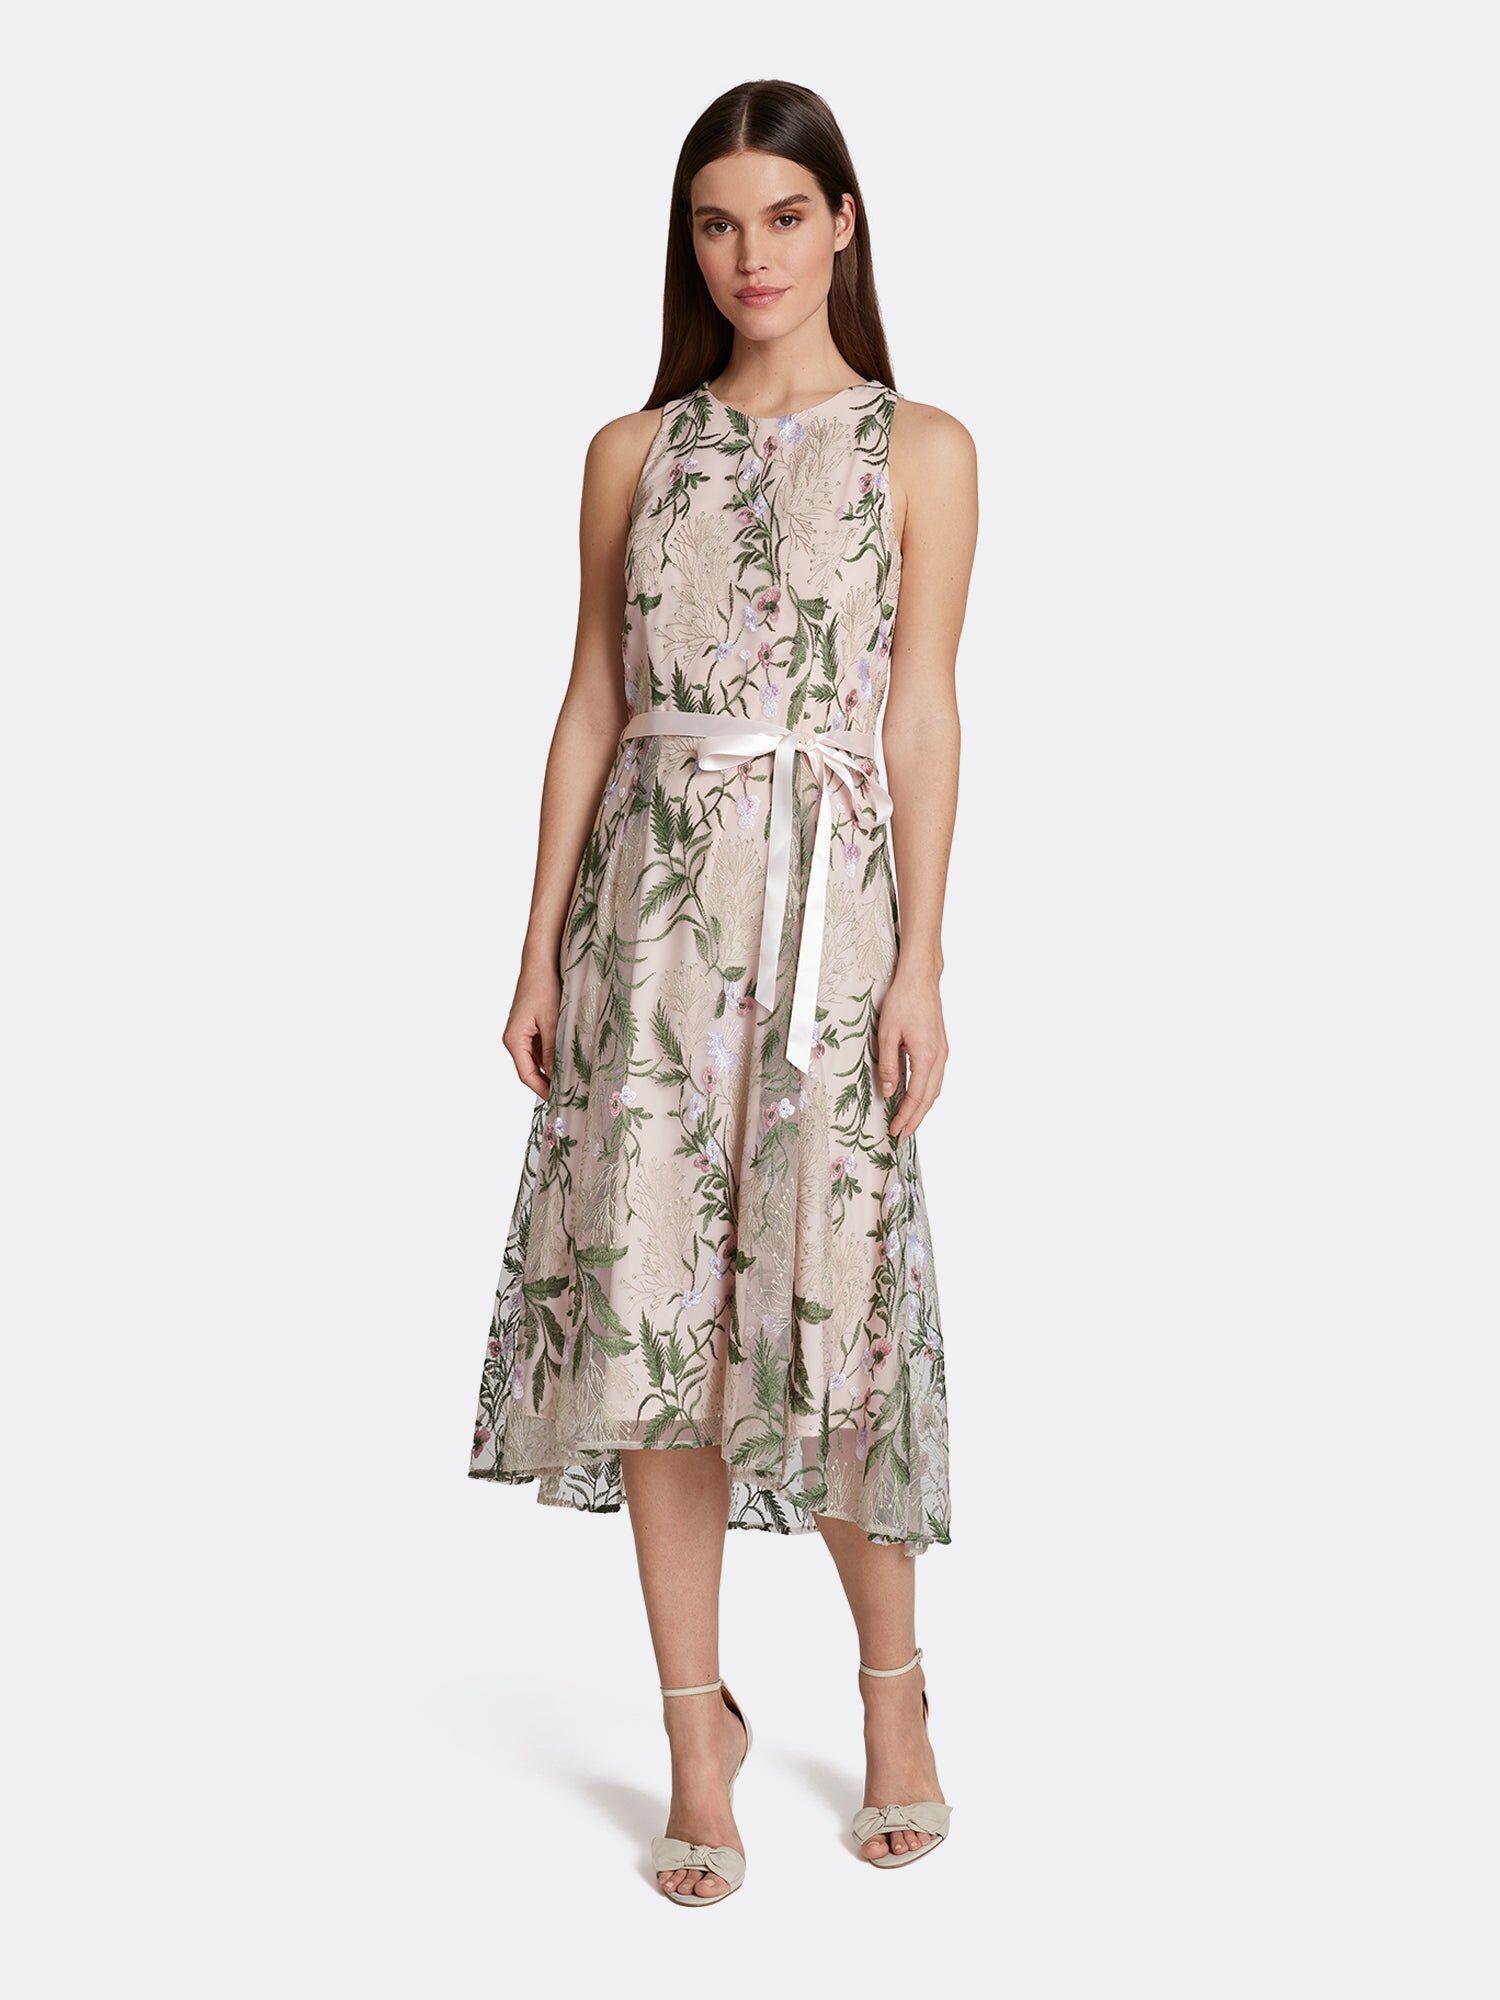 Tahari ASL Floral Embroidered Hi-Low Petite Dress Blush Multi Embroidery 6P